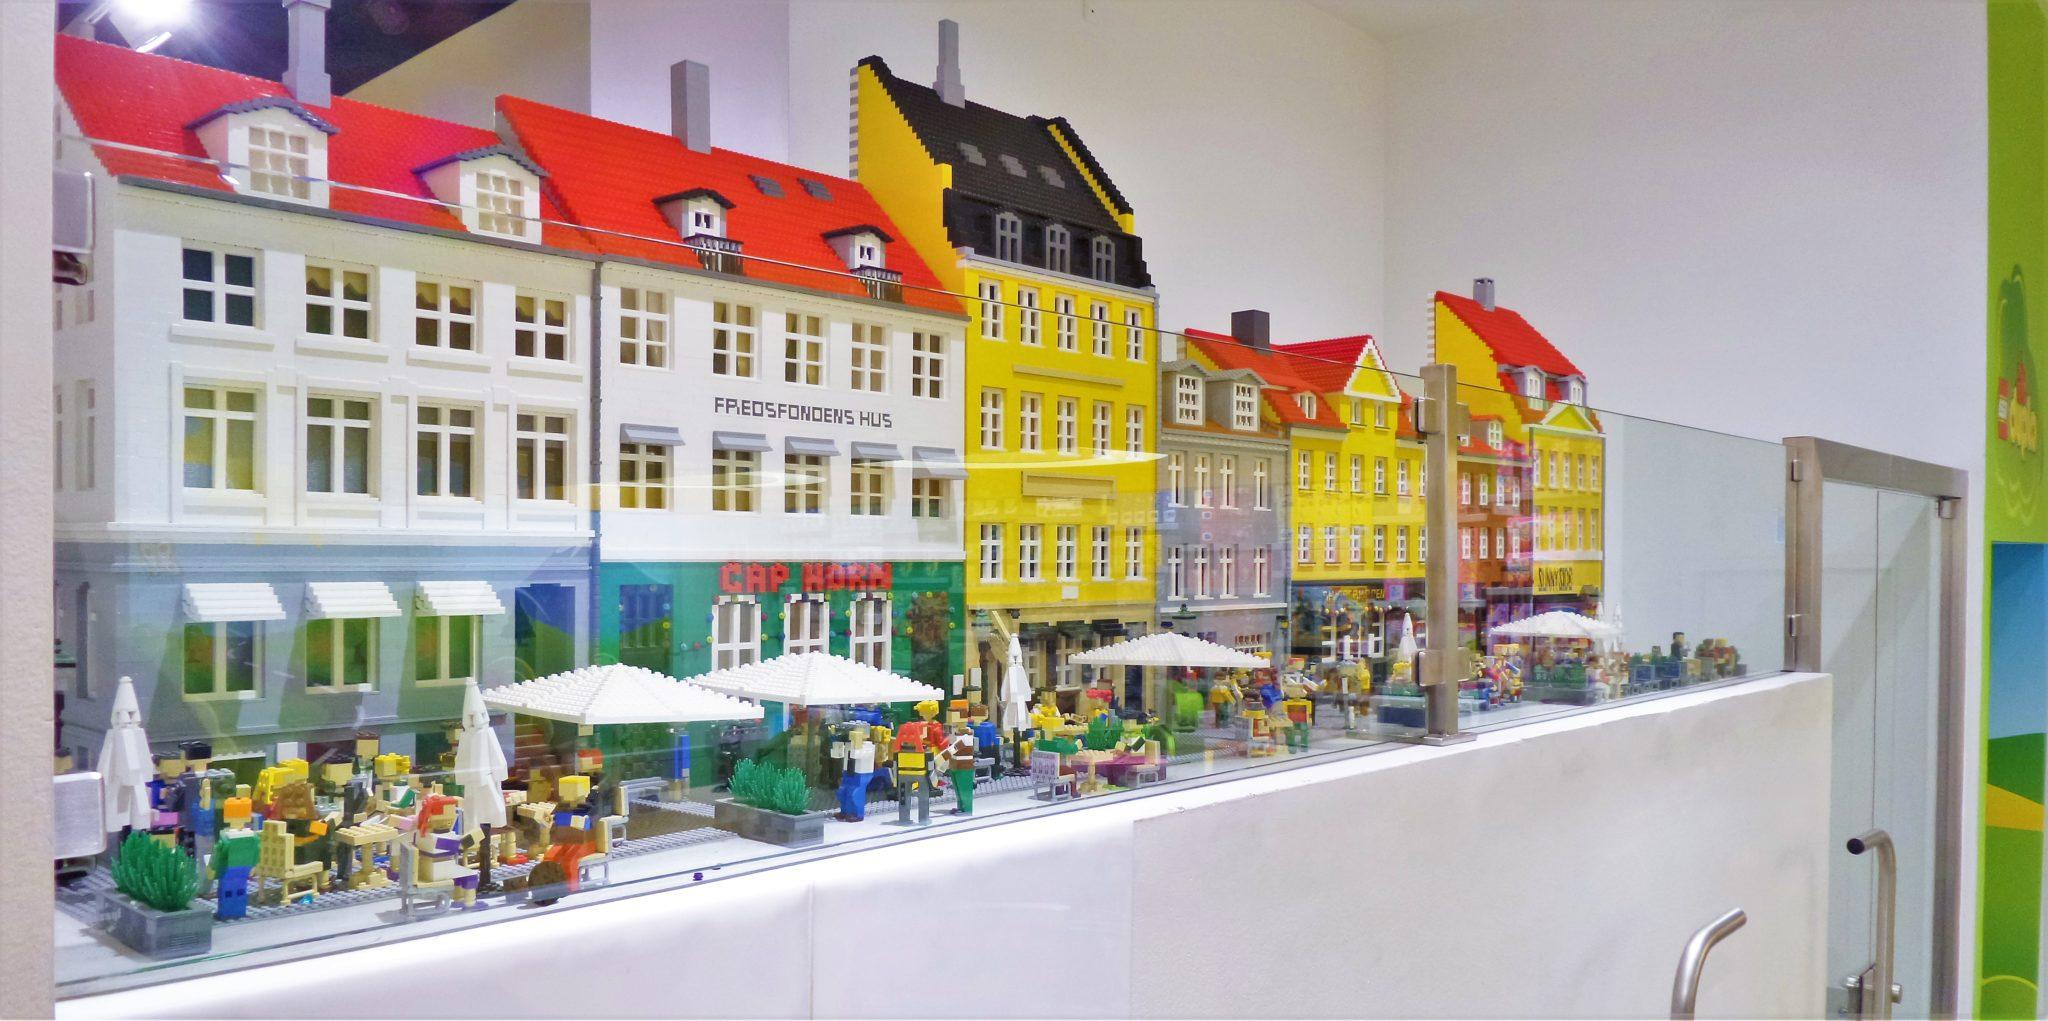 Lego nyhven in Copenhagen, Denmark